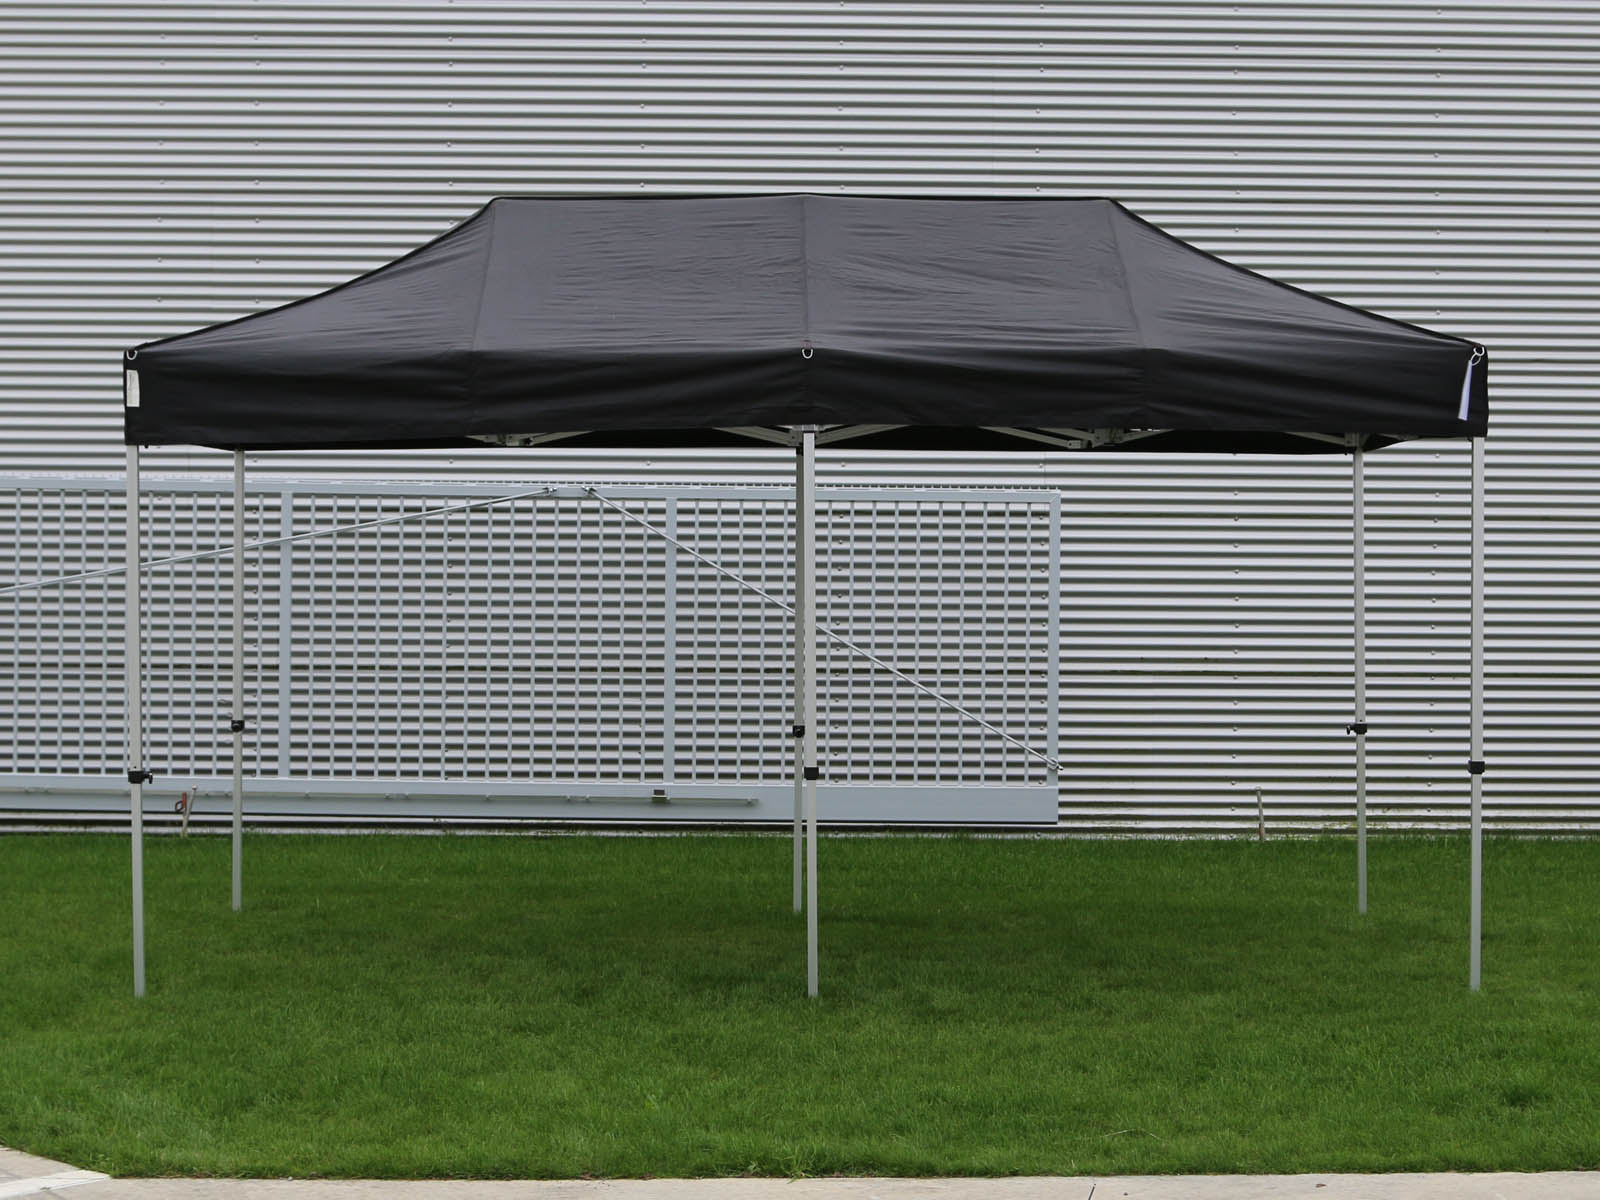 stevige plooibare partytent kopen beste prijs kwaliteit 2 5x5 aluminium polyester. Black Bedroom Furniture Sets. Home Design Ideas